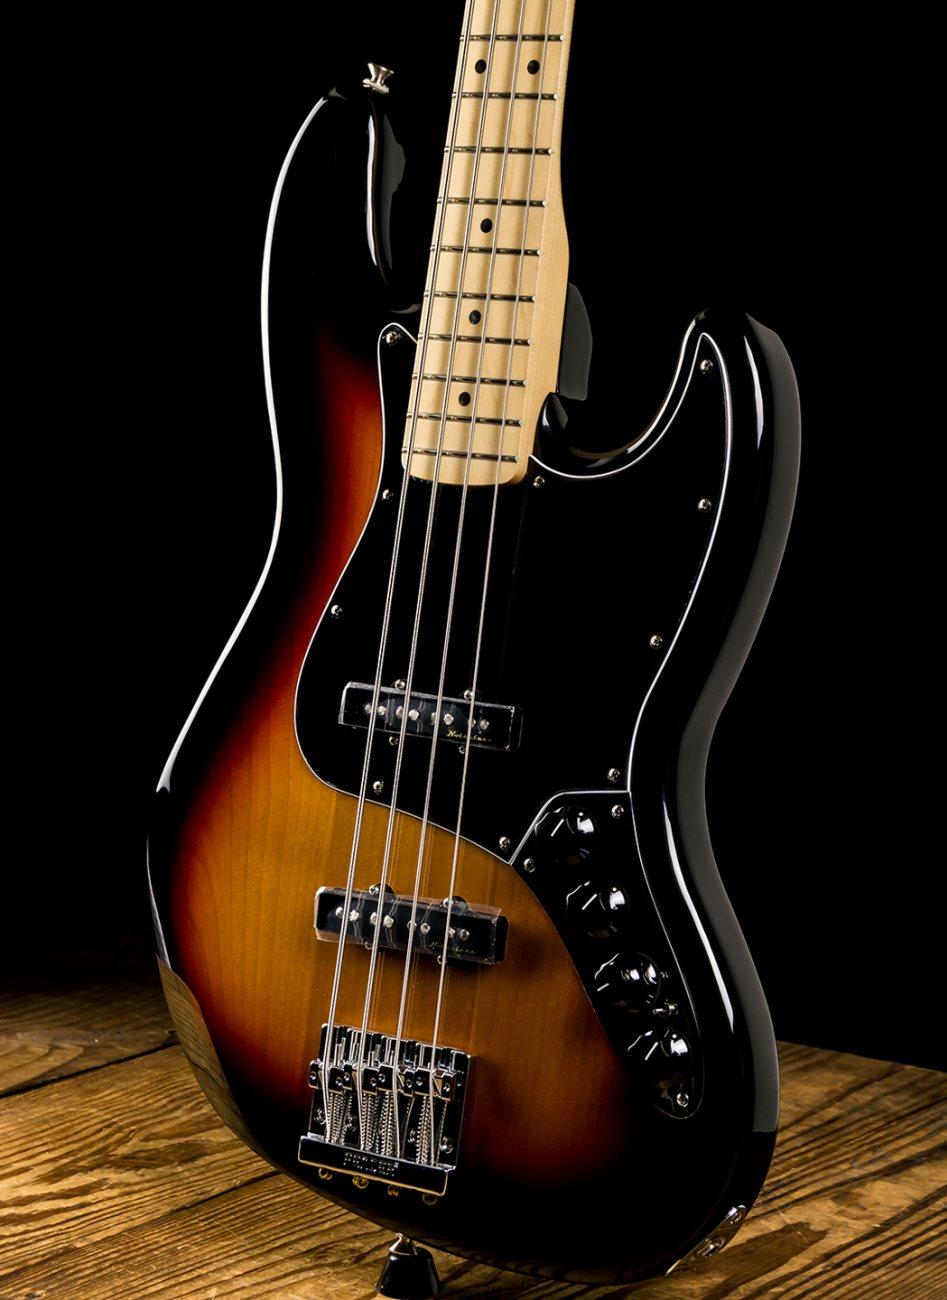 Fender Deluxe Active Jazz Bass V - 3-Color Sunburst